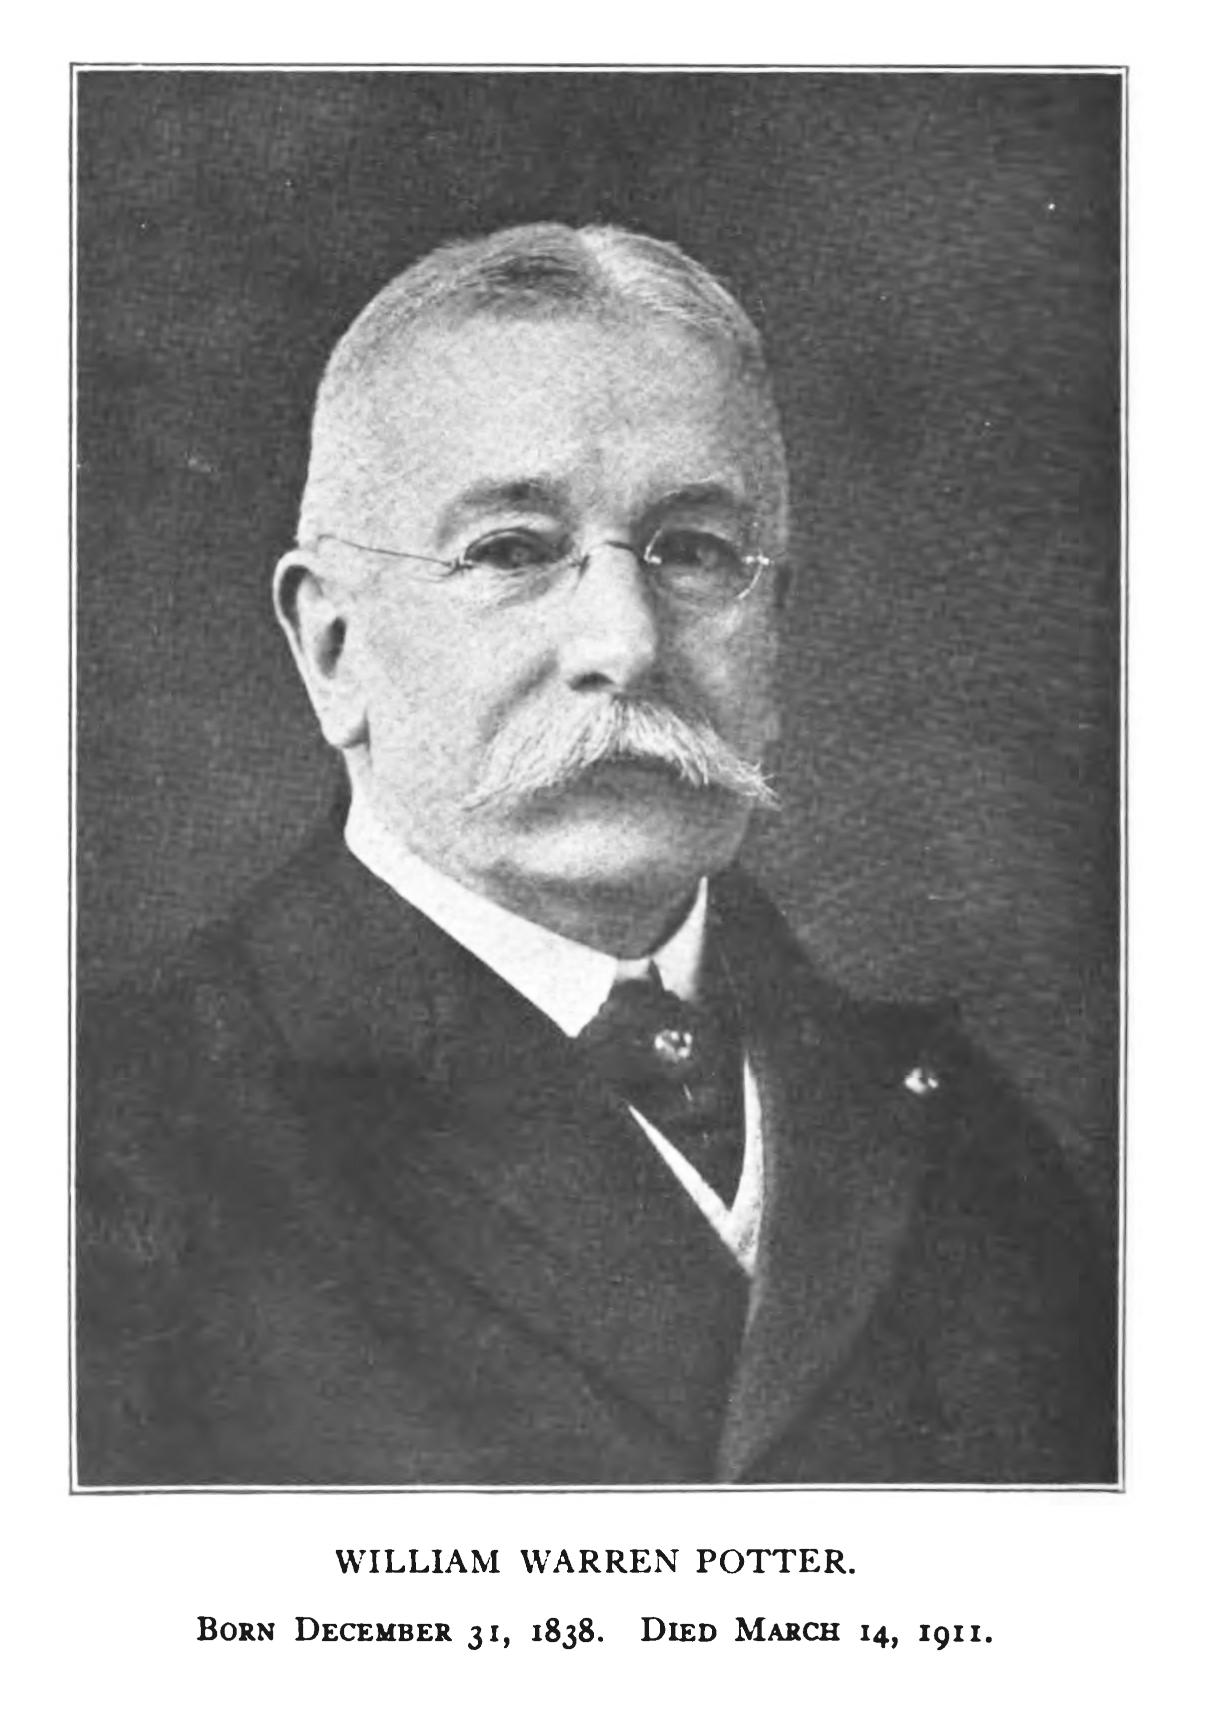 FSMB | Centennial Celebration | Walter L. Bierring and the Early FSMB ...